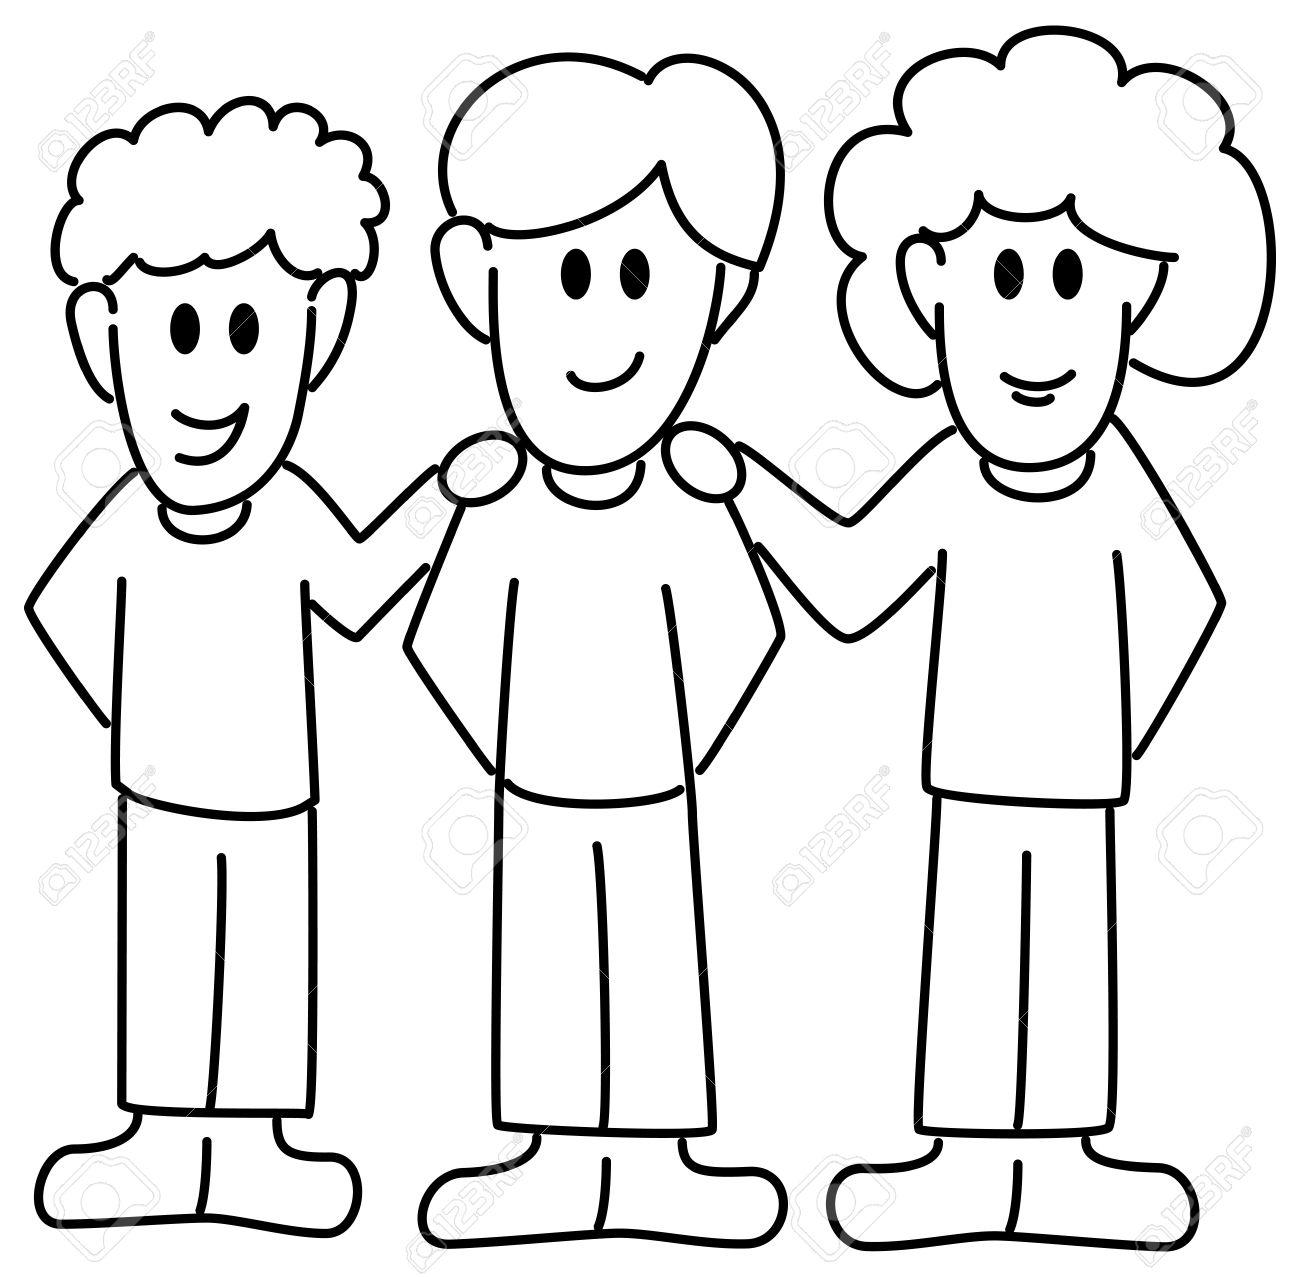 1300x1277 Vector Illustration Of Three Cartoon Friends Royalty Free Cliparts